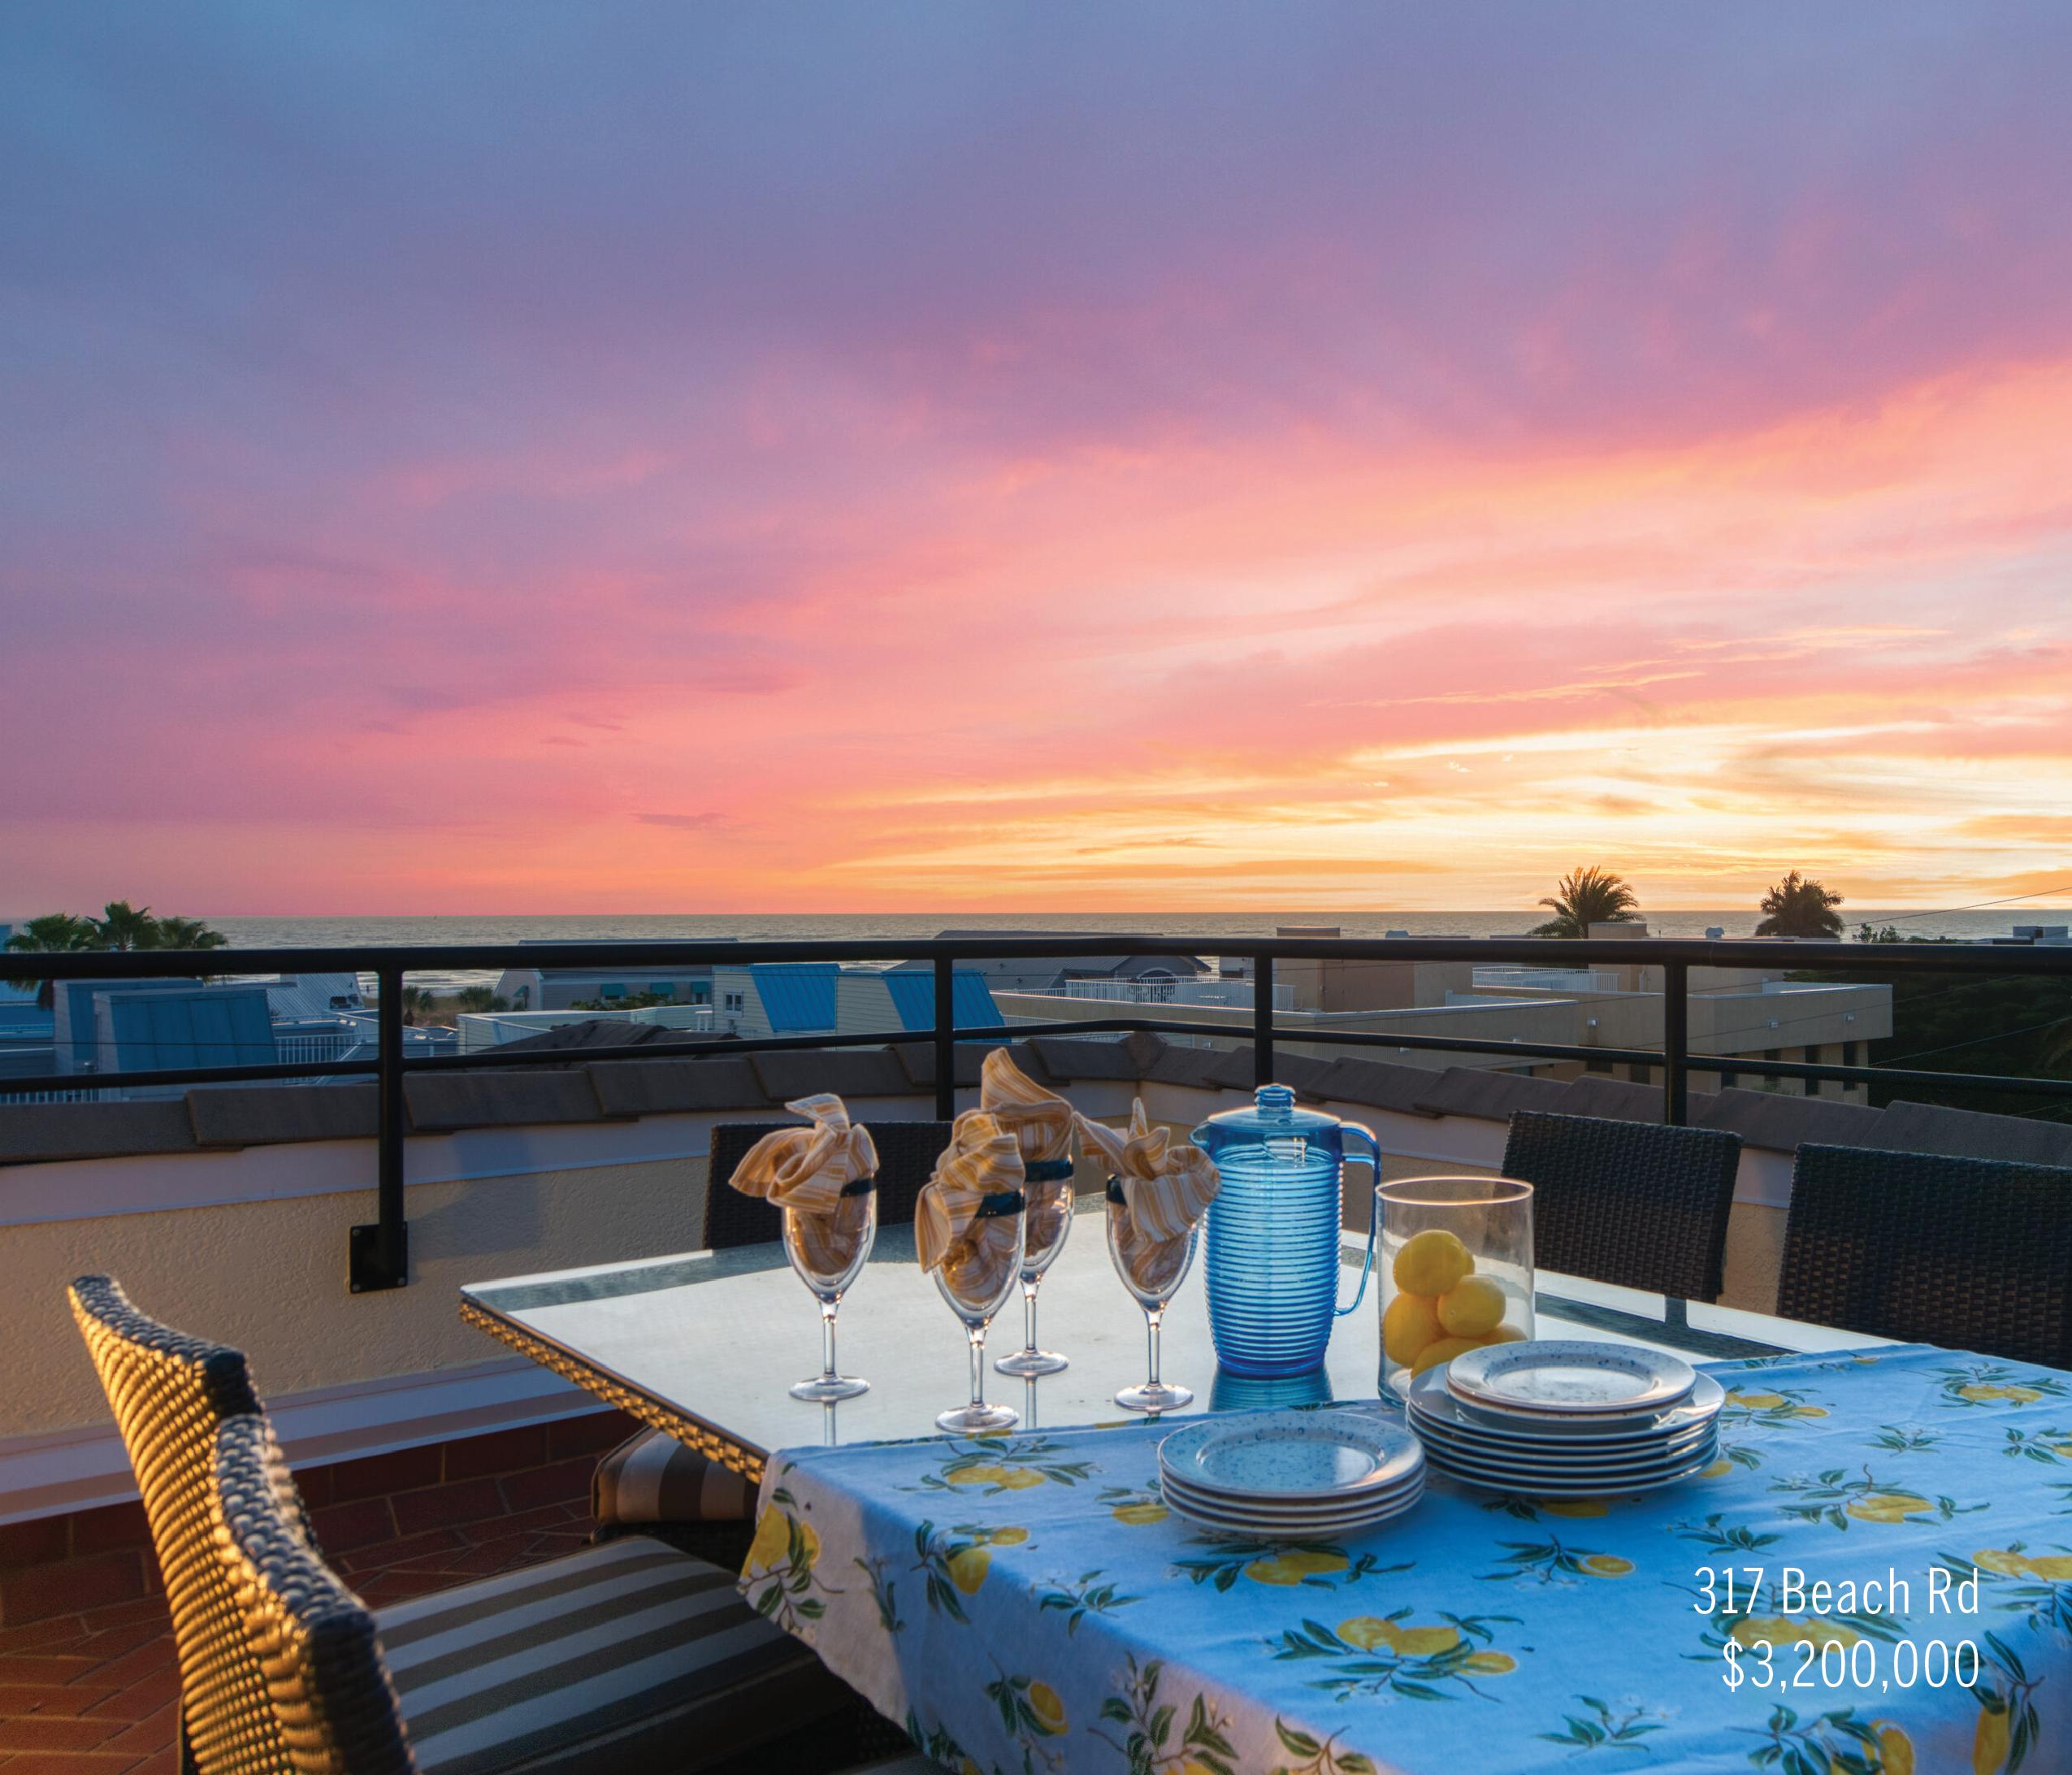 Siesta Key 2020 Year End Real Estate Market 317 Beach